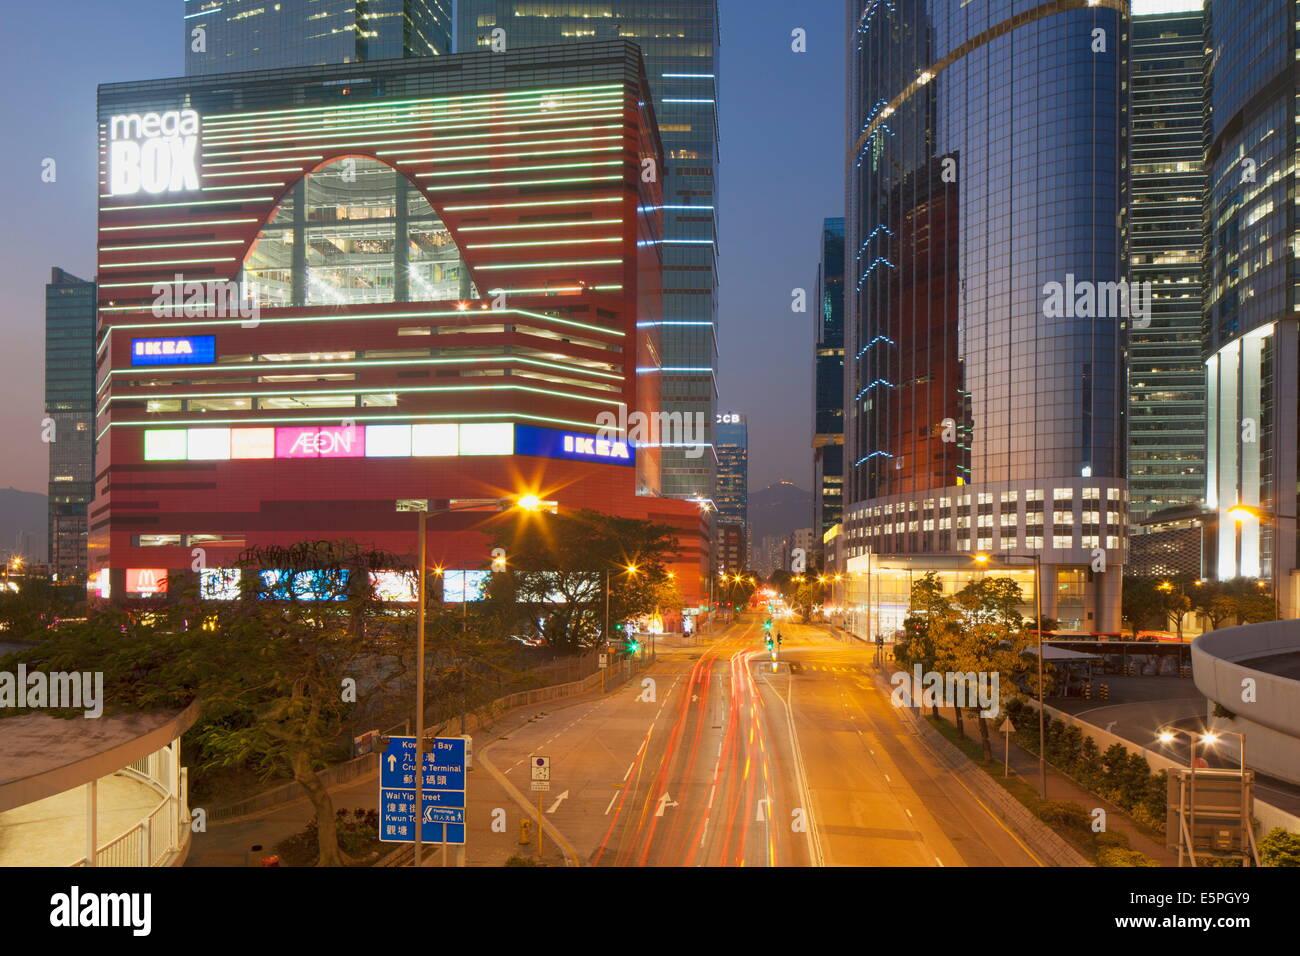 Megabox Stock Photos & Megabox Stock Images - Alamy